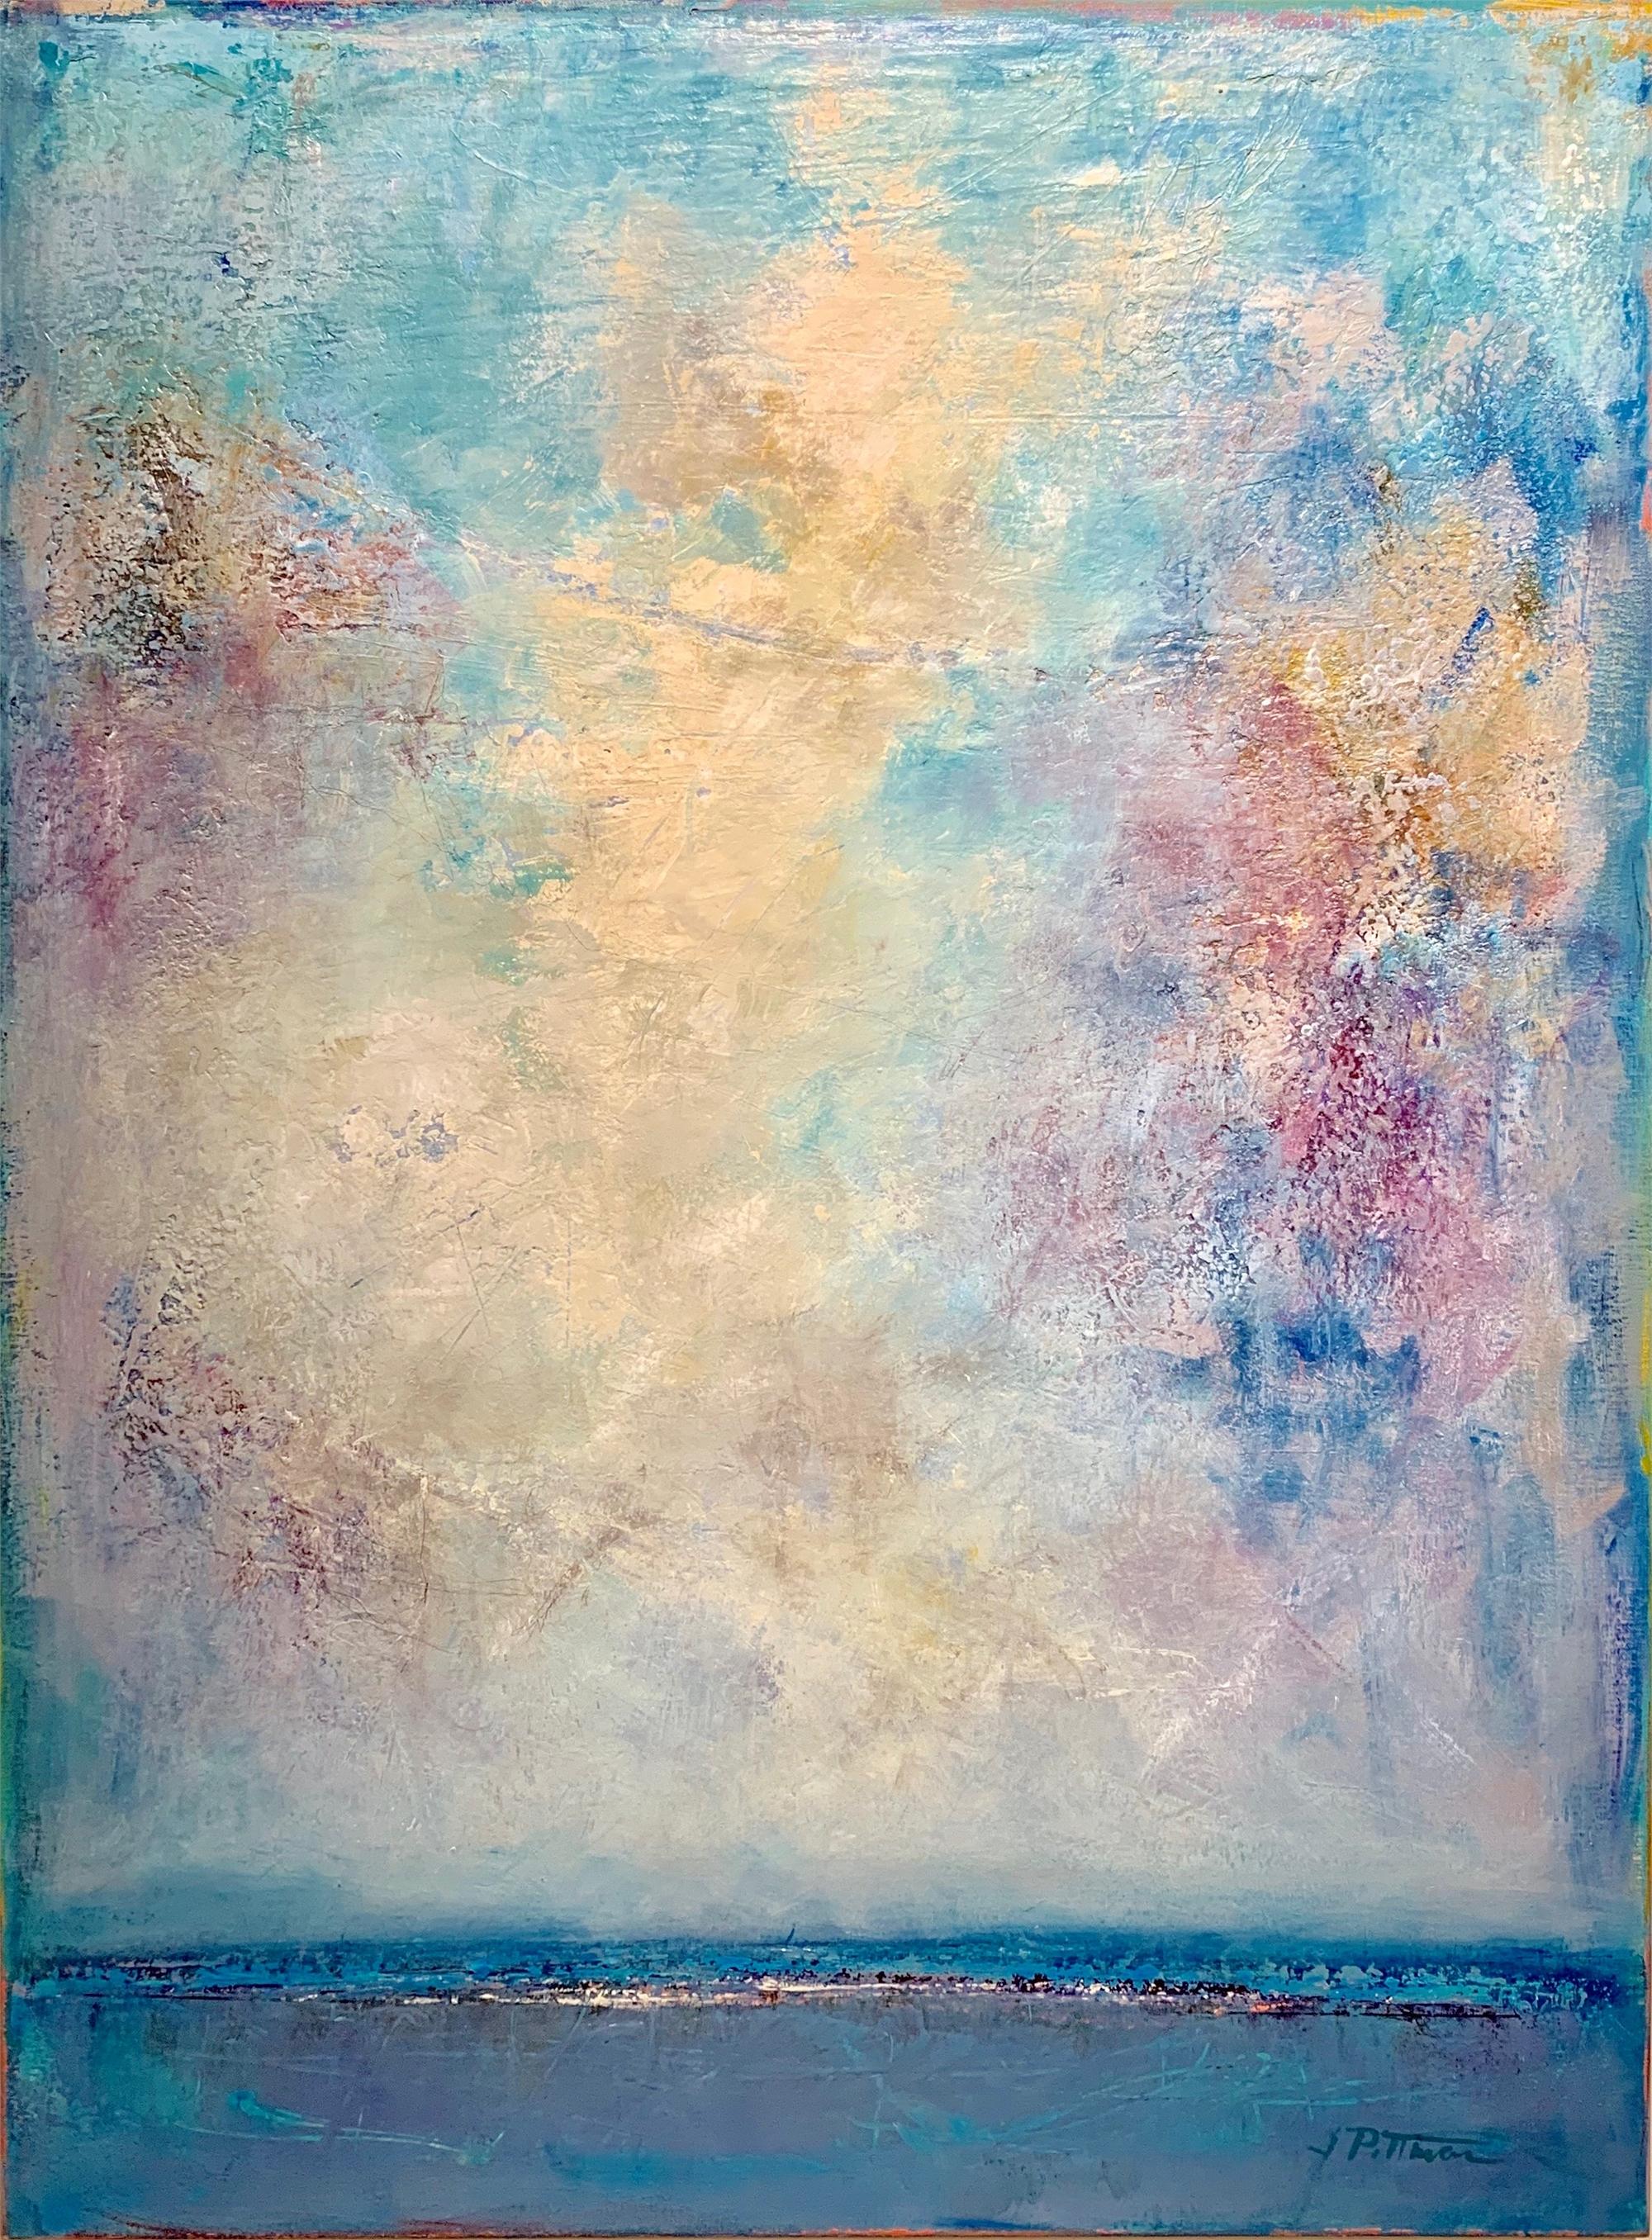 Sea Clouds by Jim Pittman